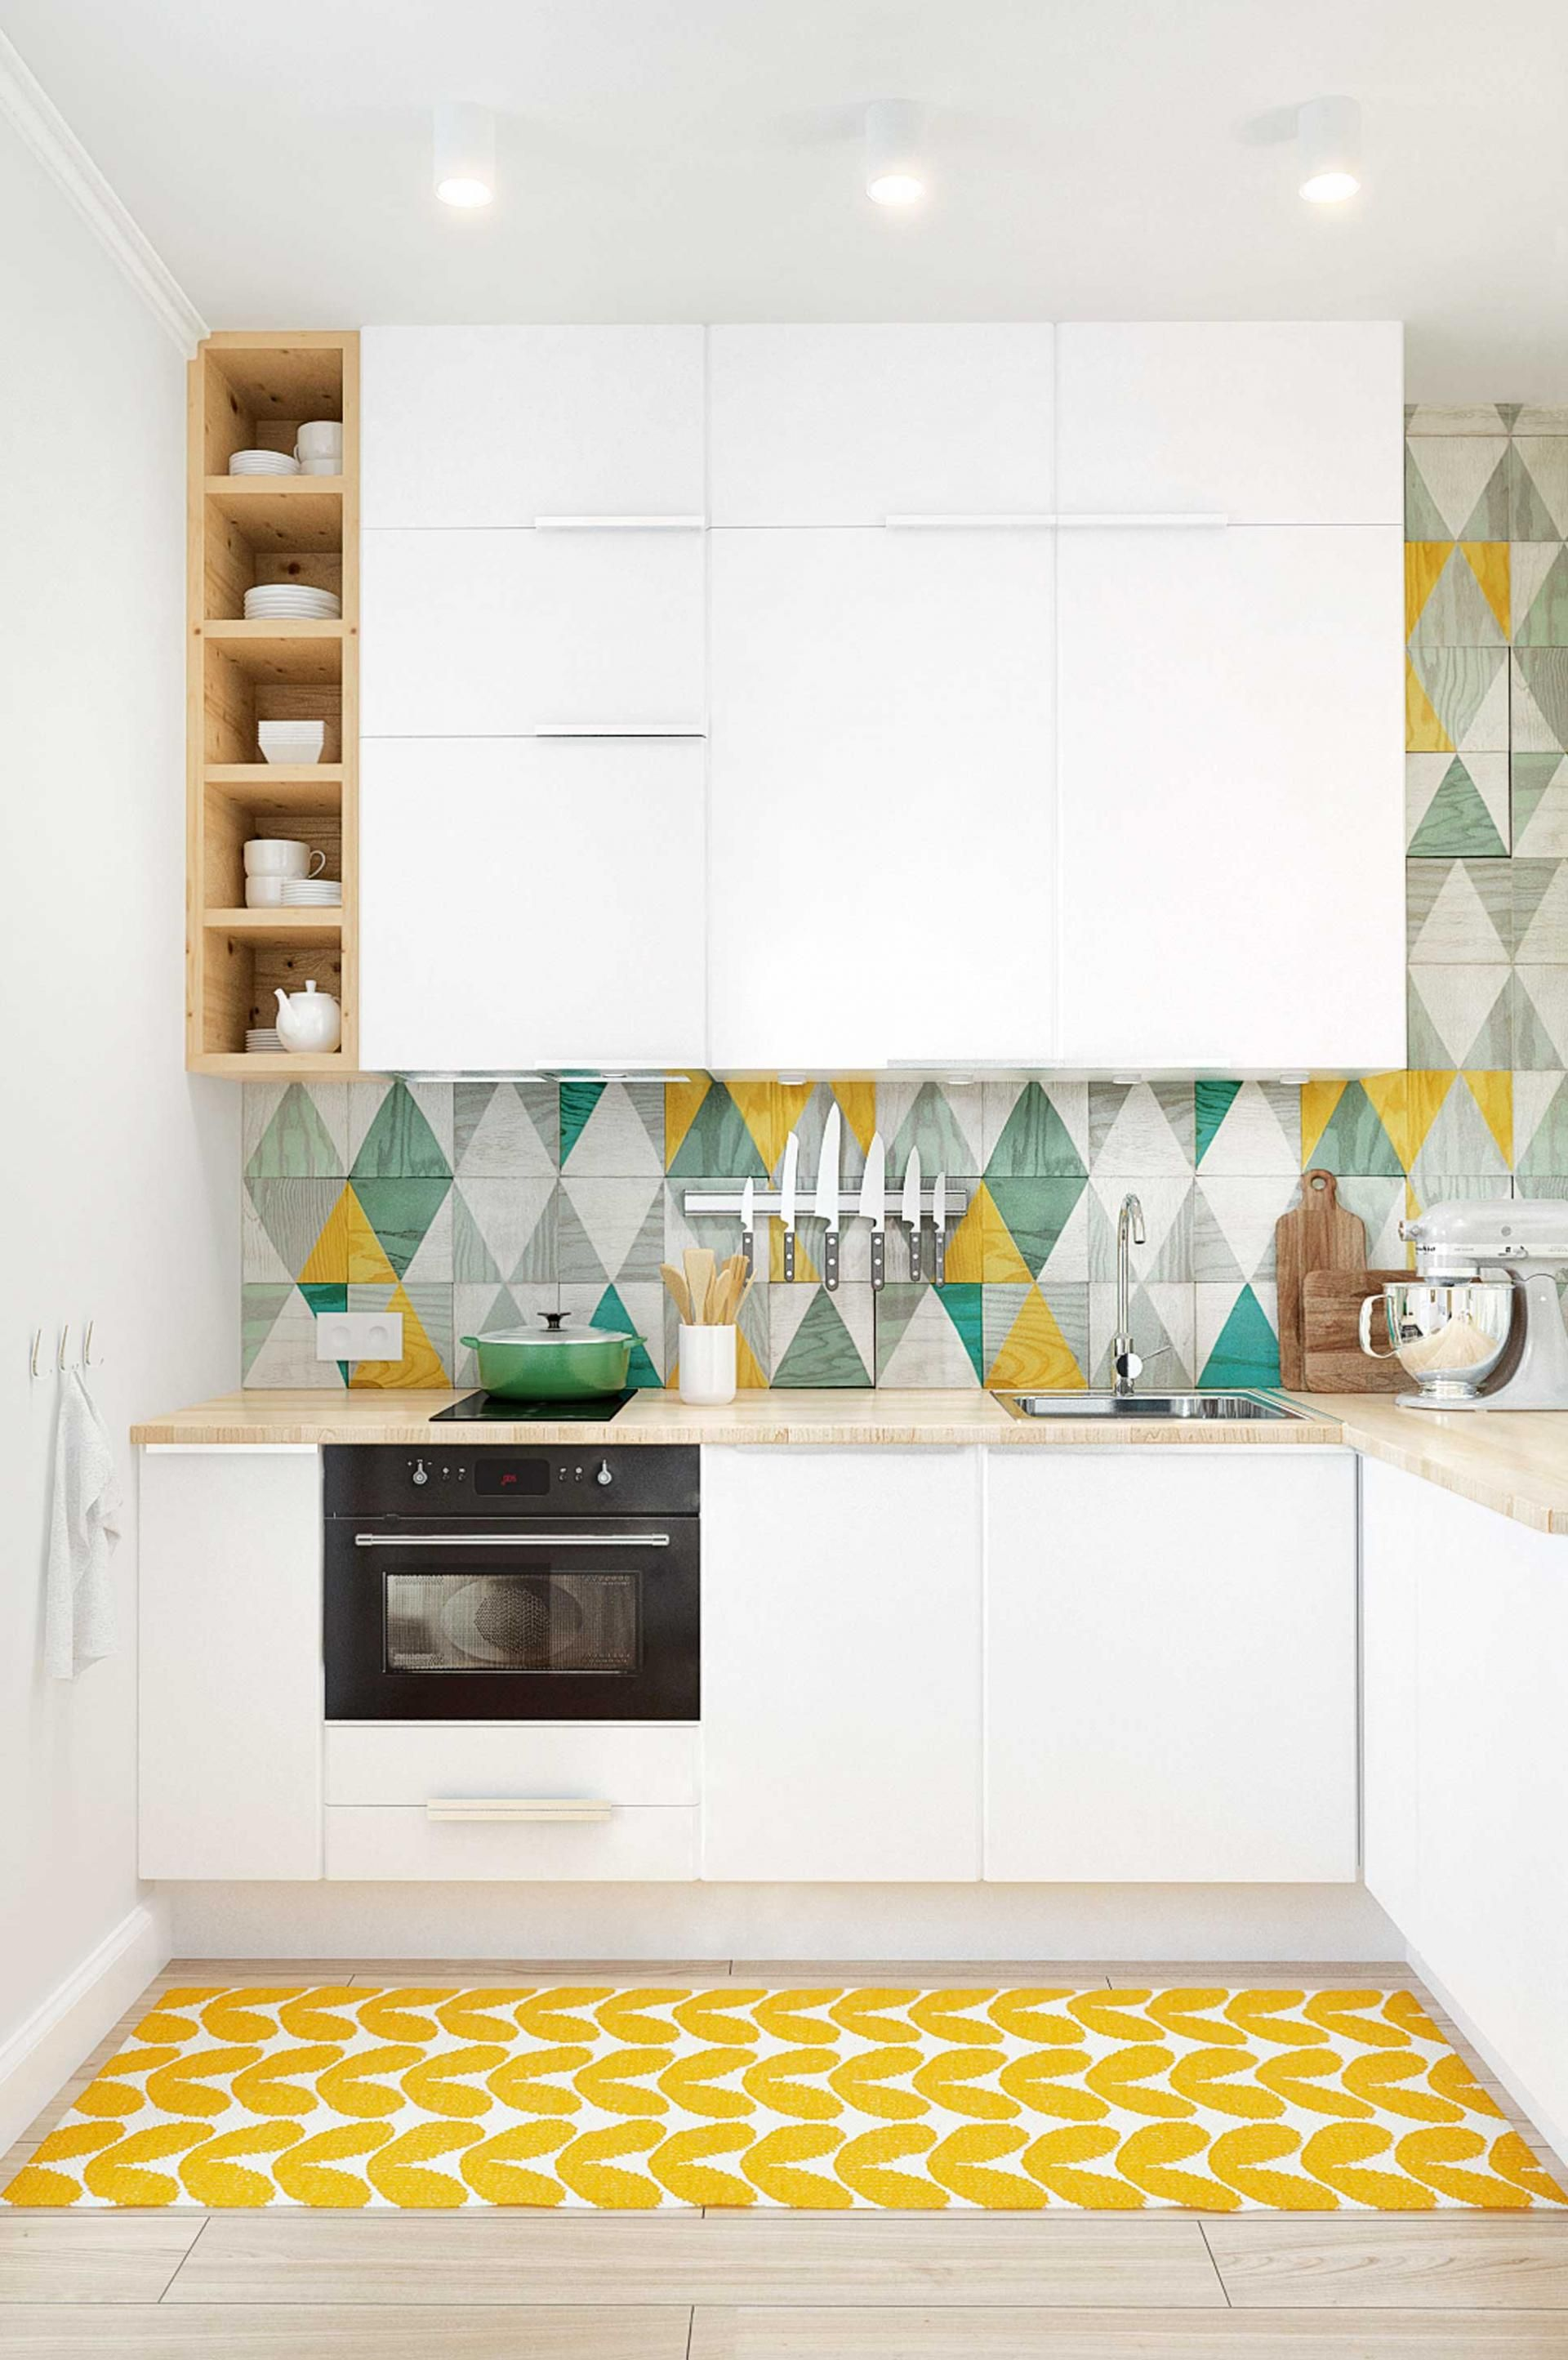 Kitchen wallpaper border   kitchen design ideas Project by Int Architecture  Kitchens